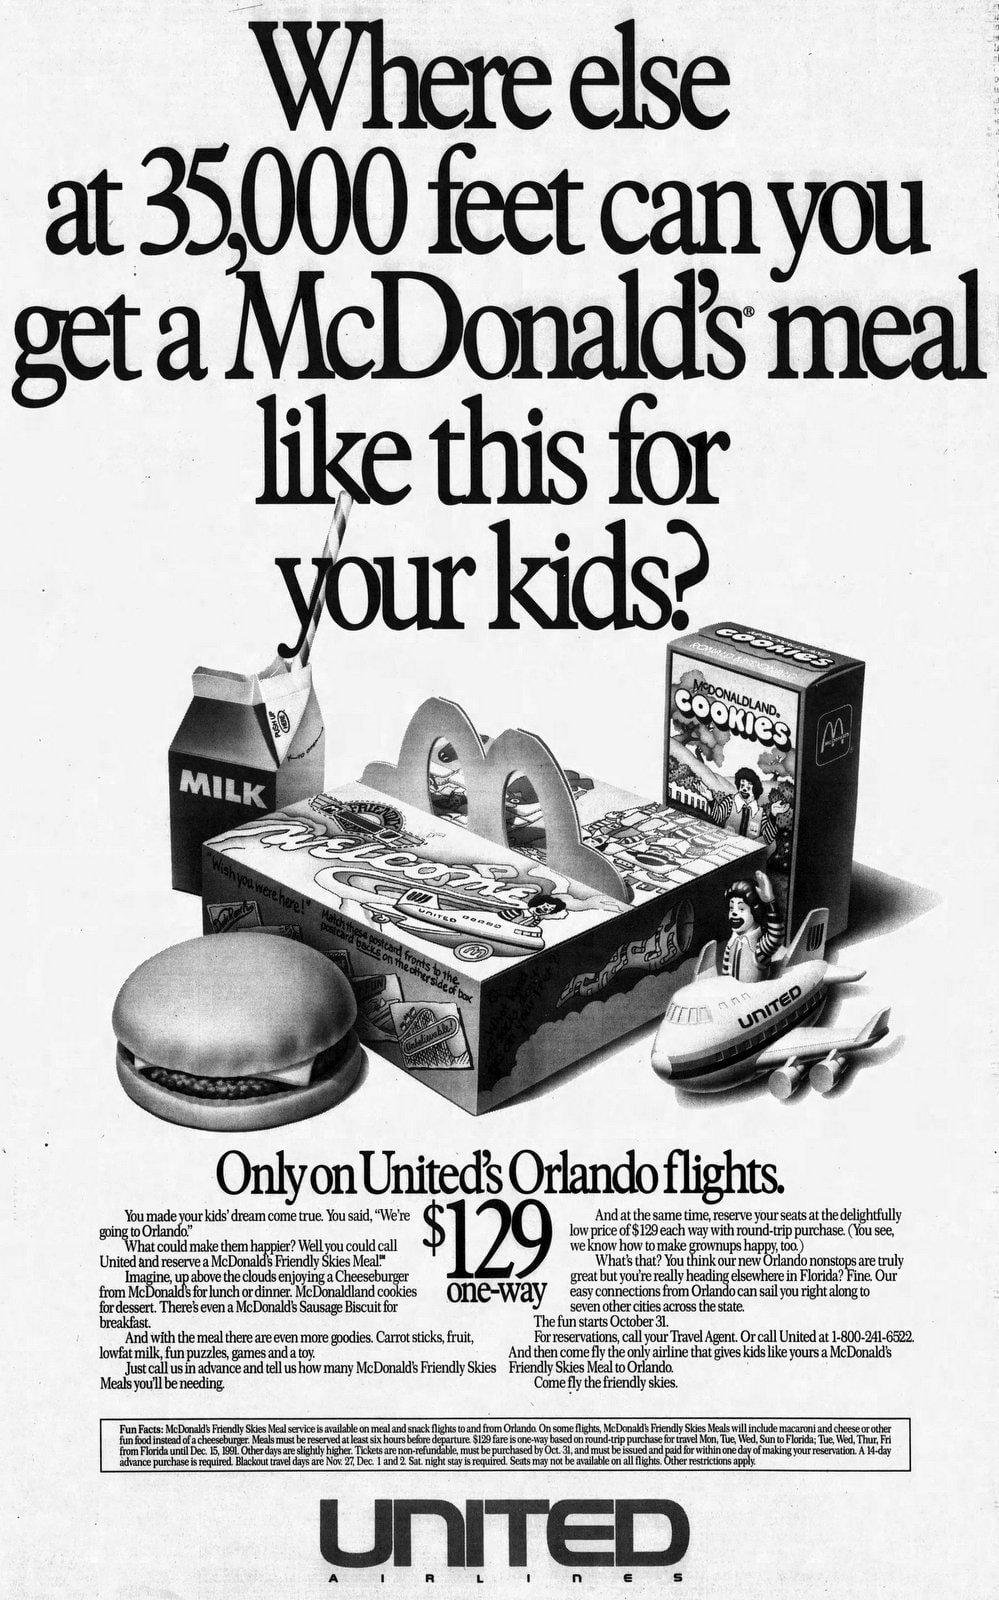 McDonald's Friendly Skies Meals